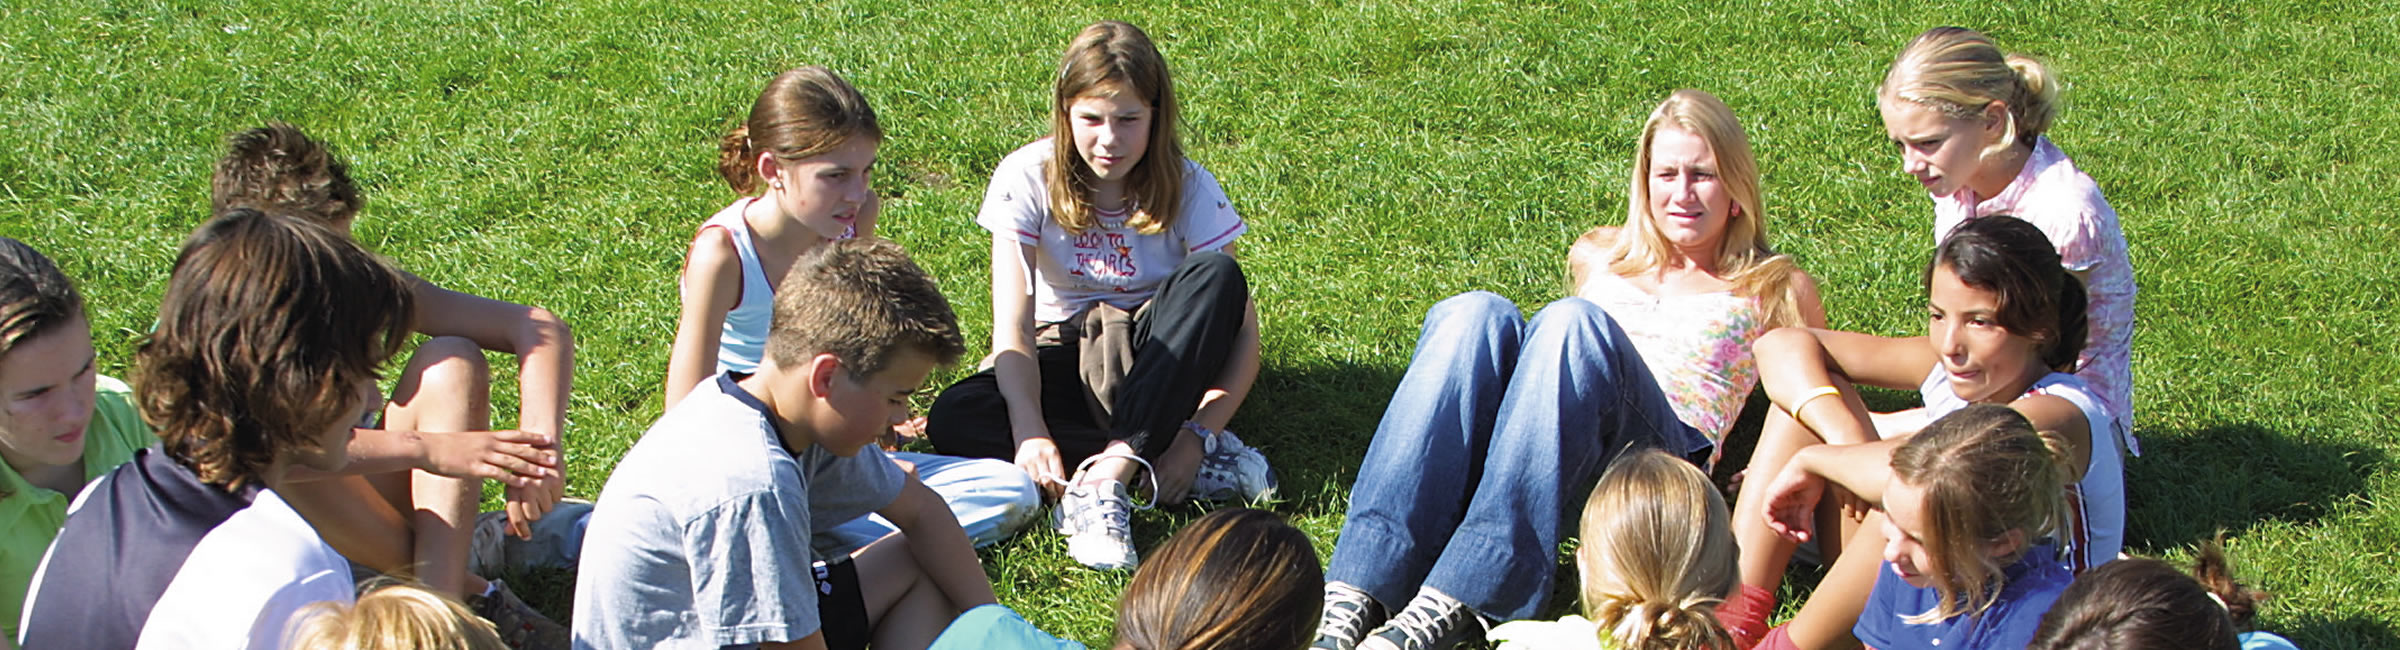 groepsaccommodatie-schoolkamp.jpg